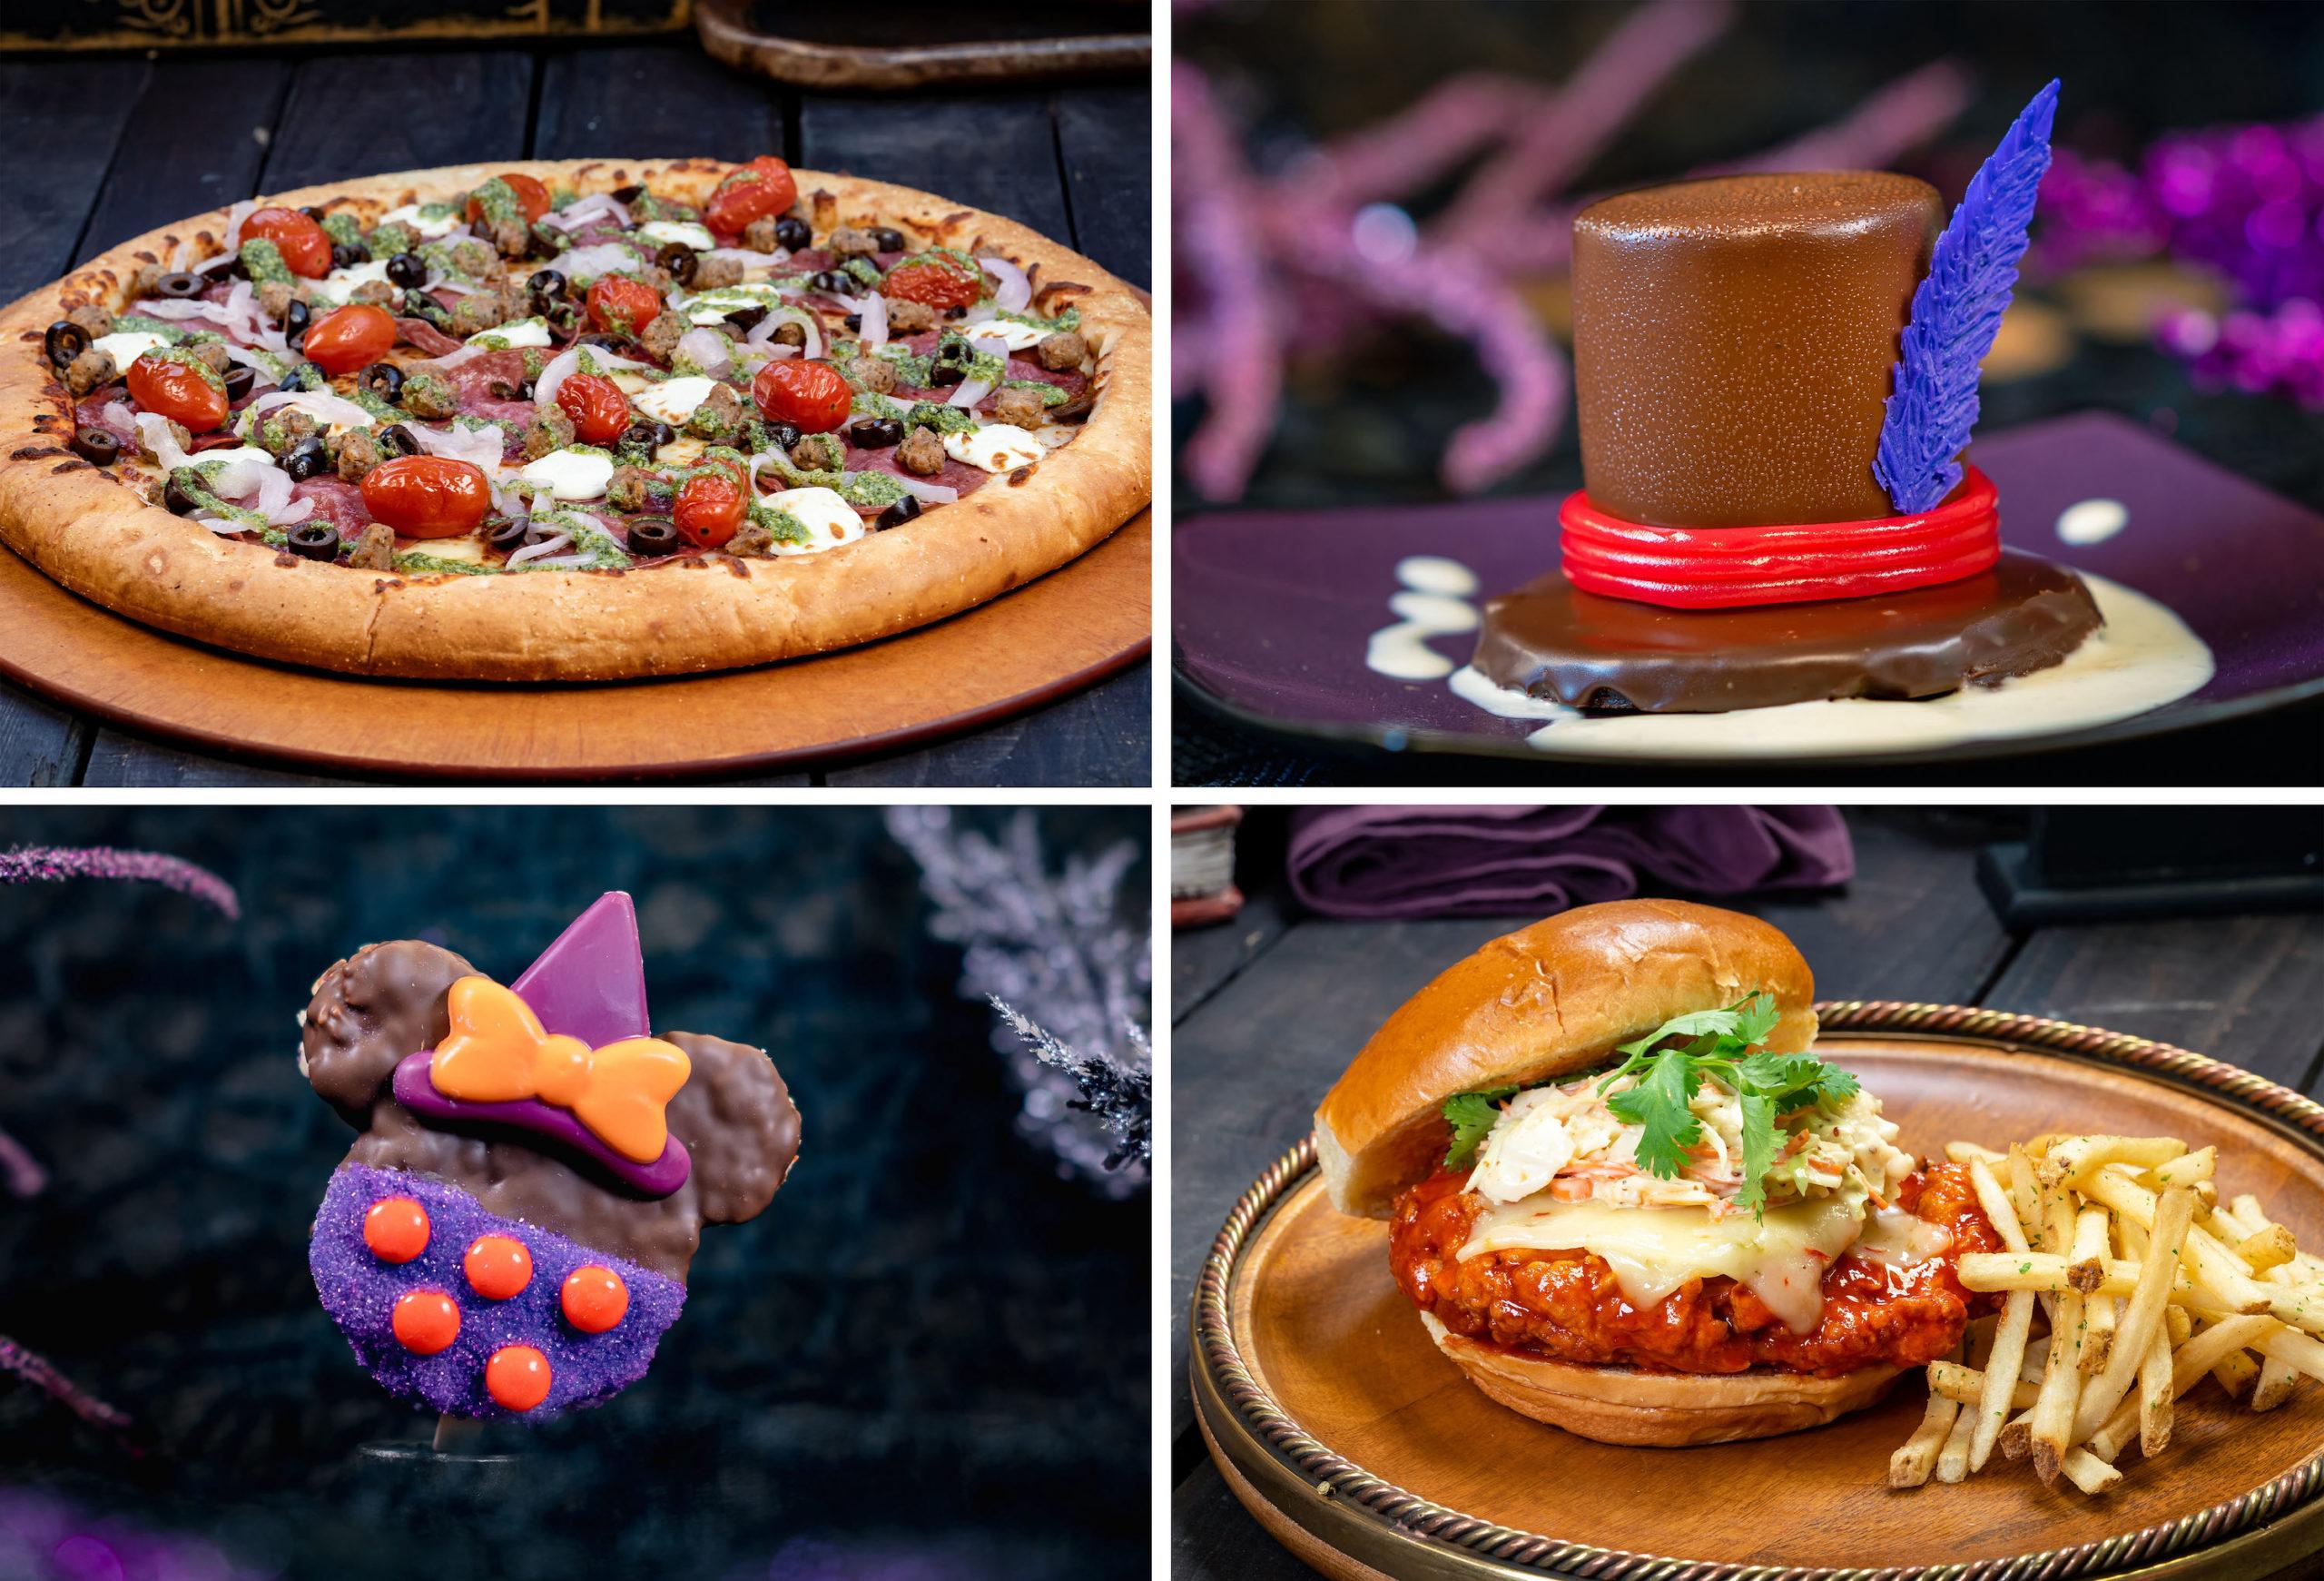 Disneyland snack